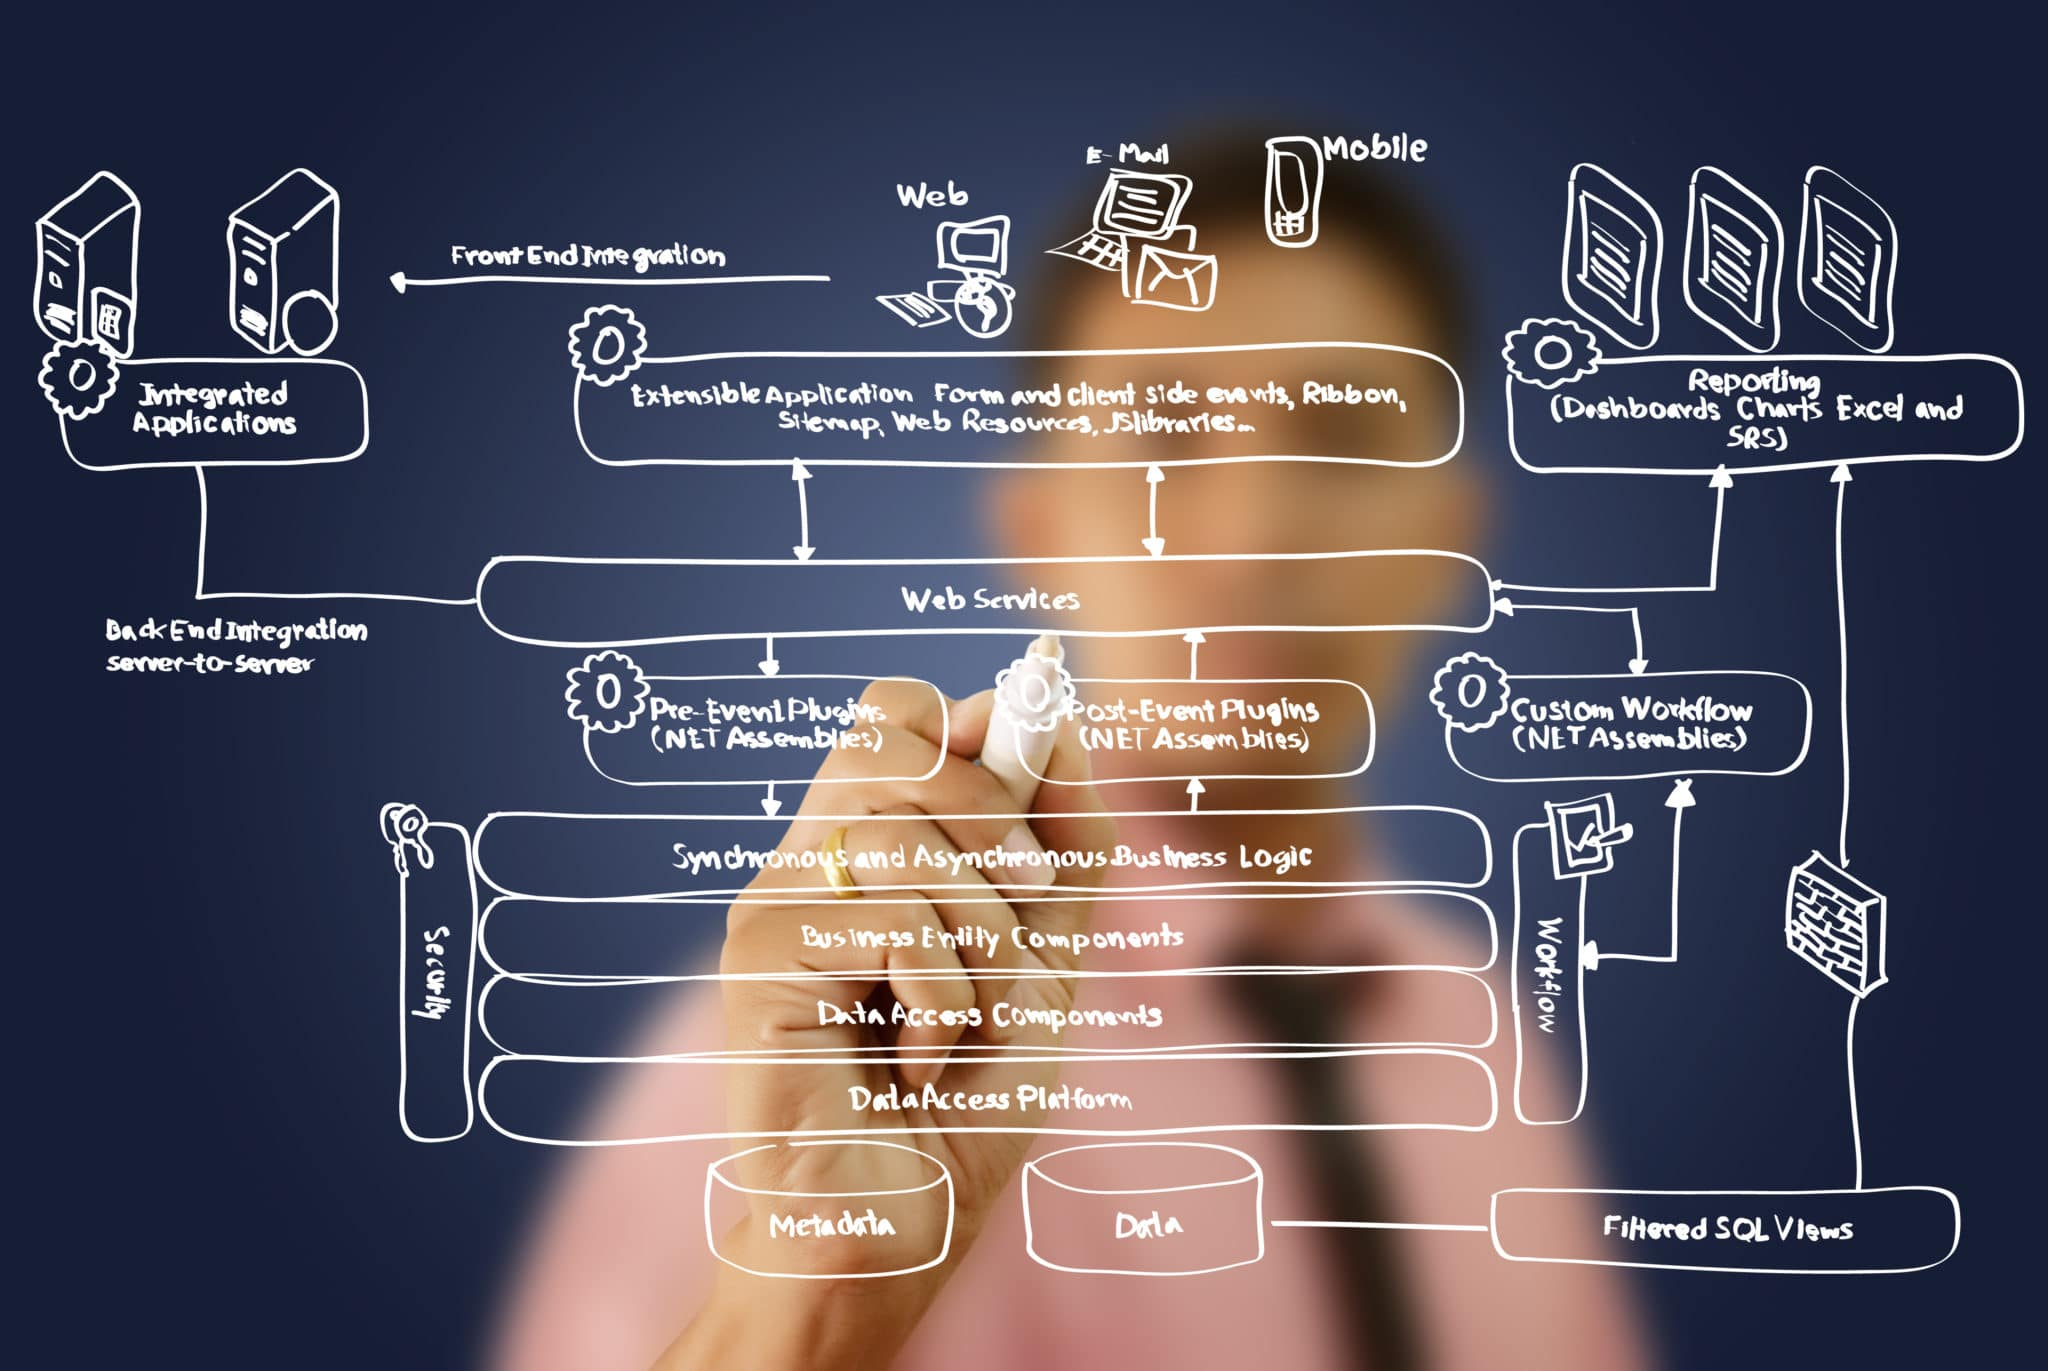 IBM Maximo Web Service